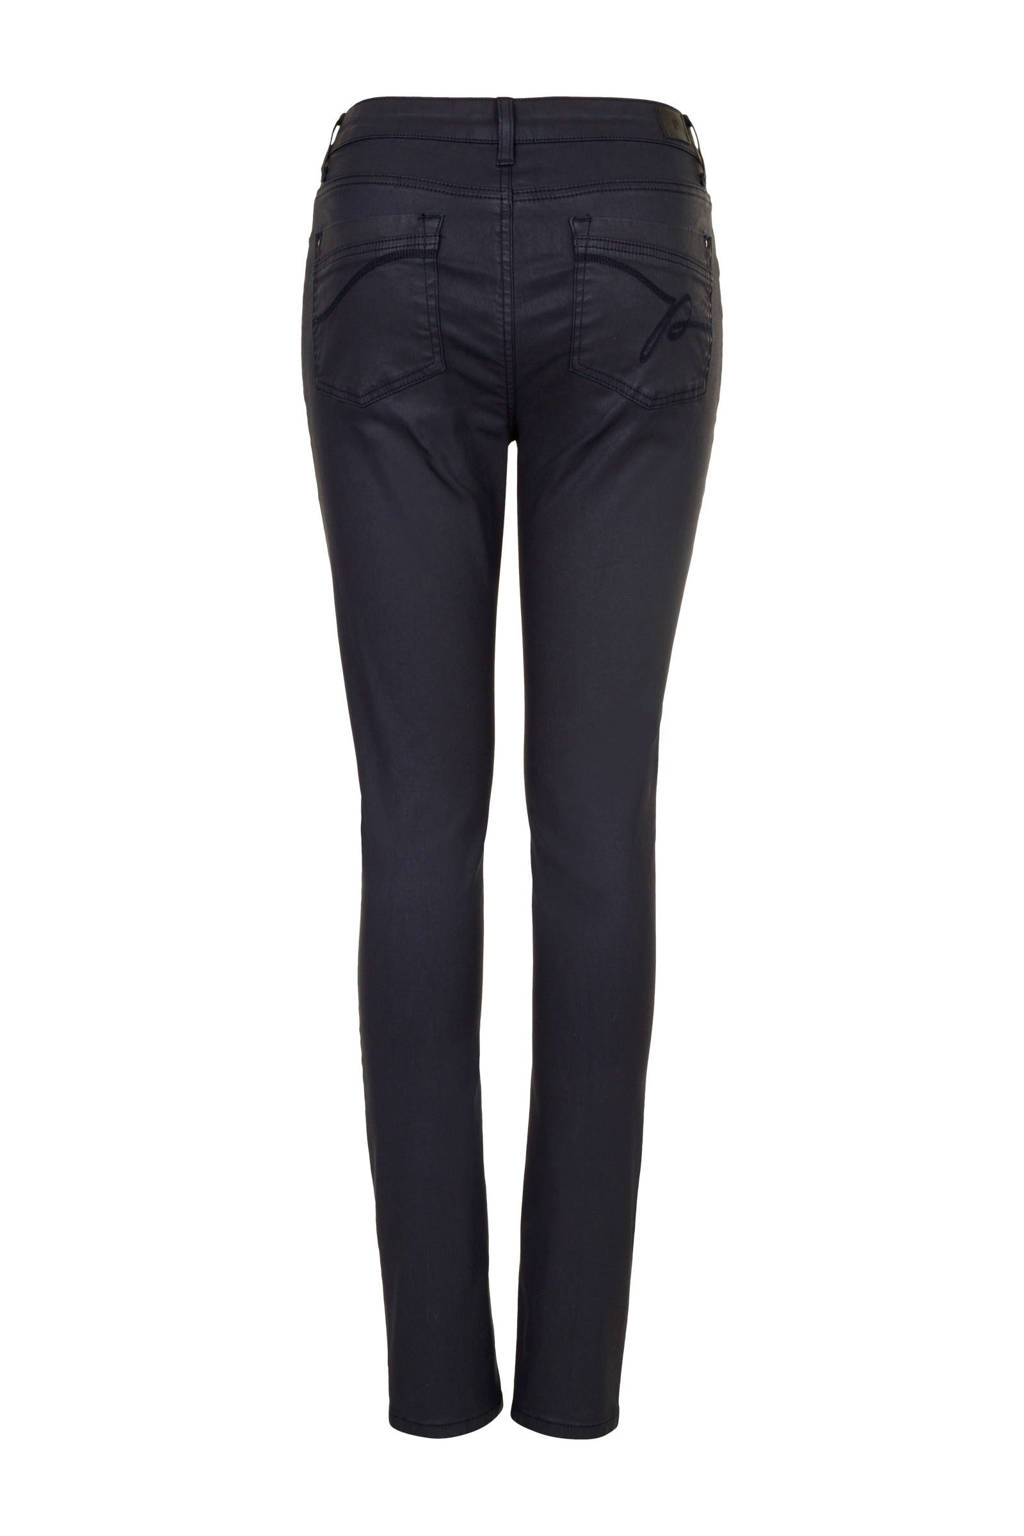 PROMISS coated high waist skinny jeans donkerblauw, Donkerblauw